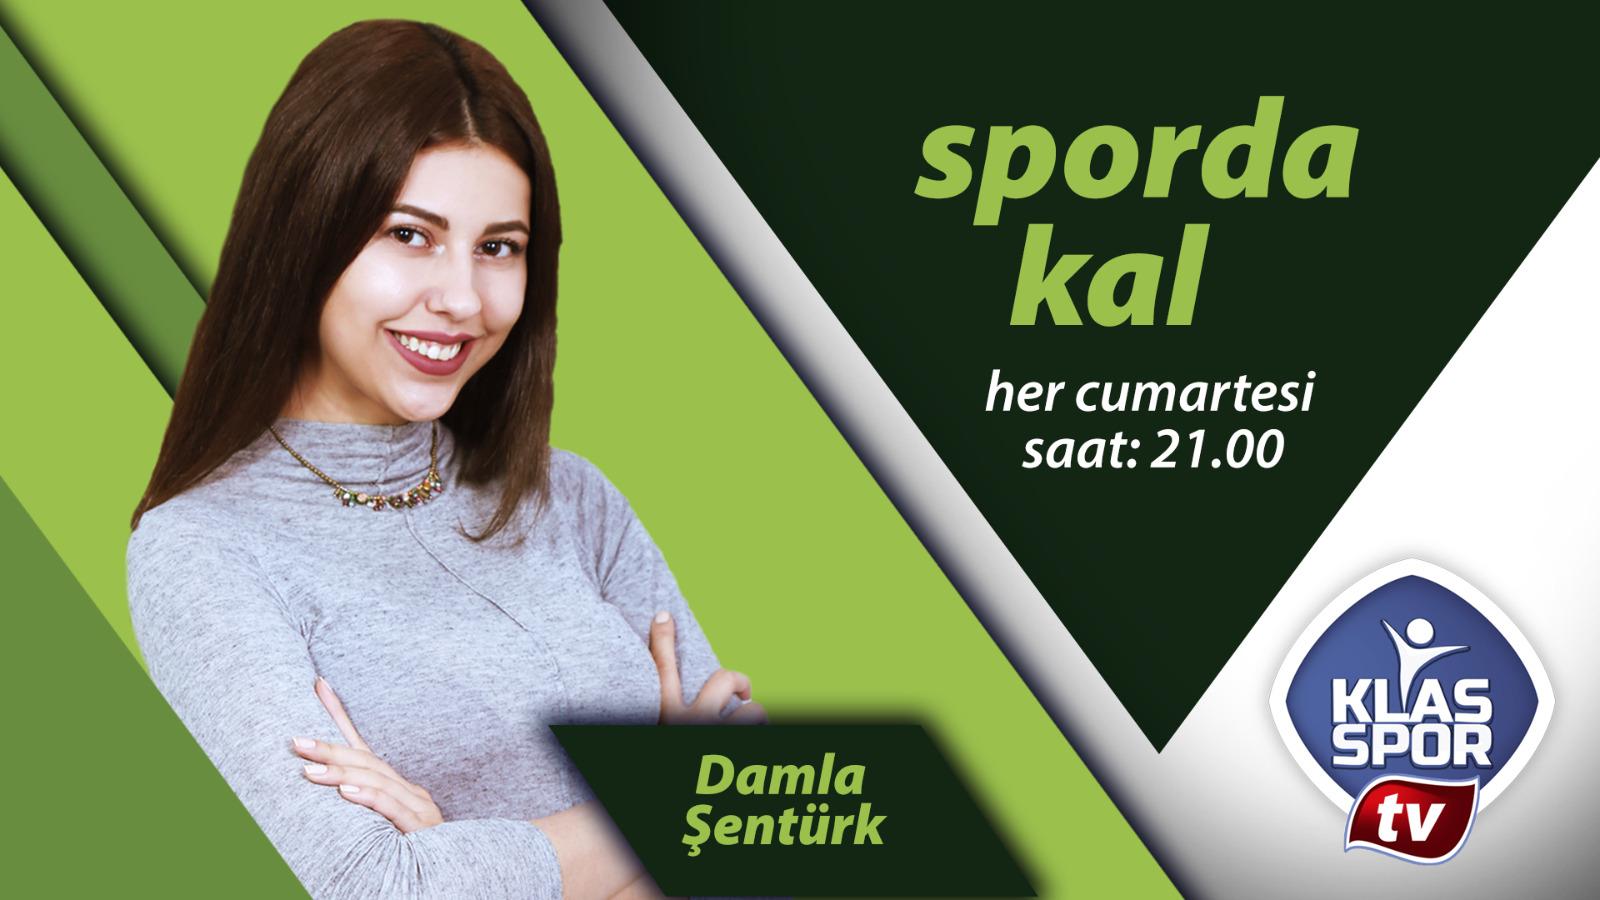 SPORDA KAL